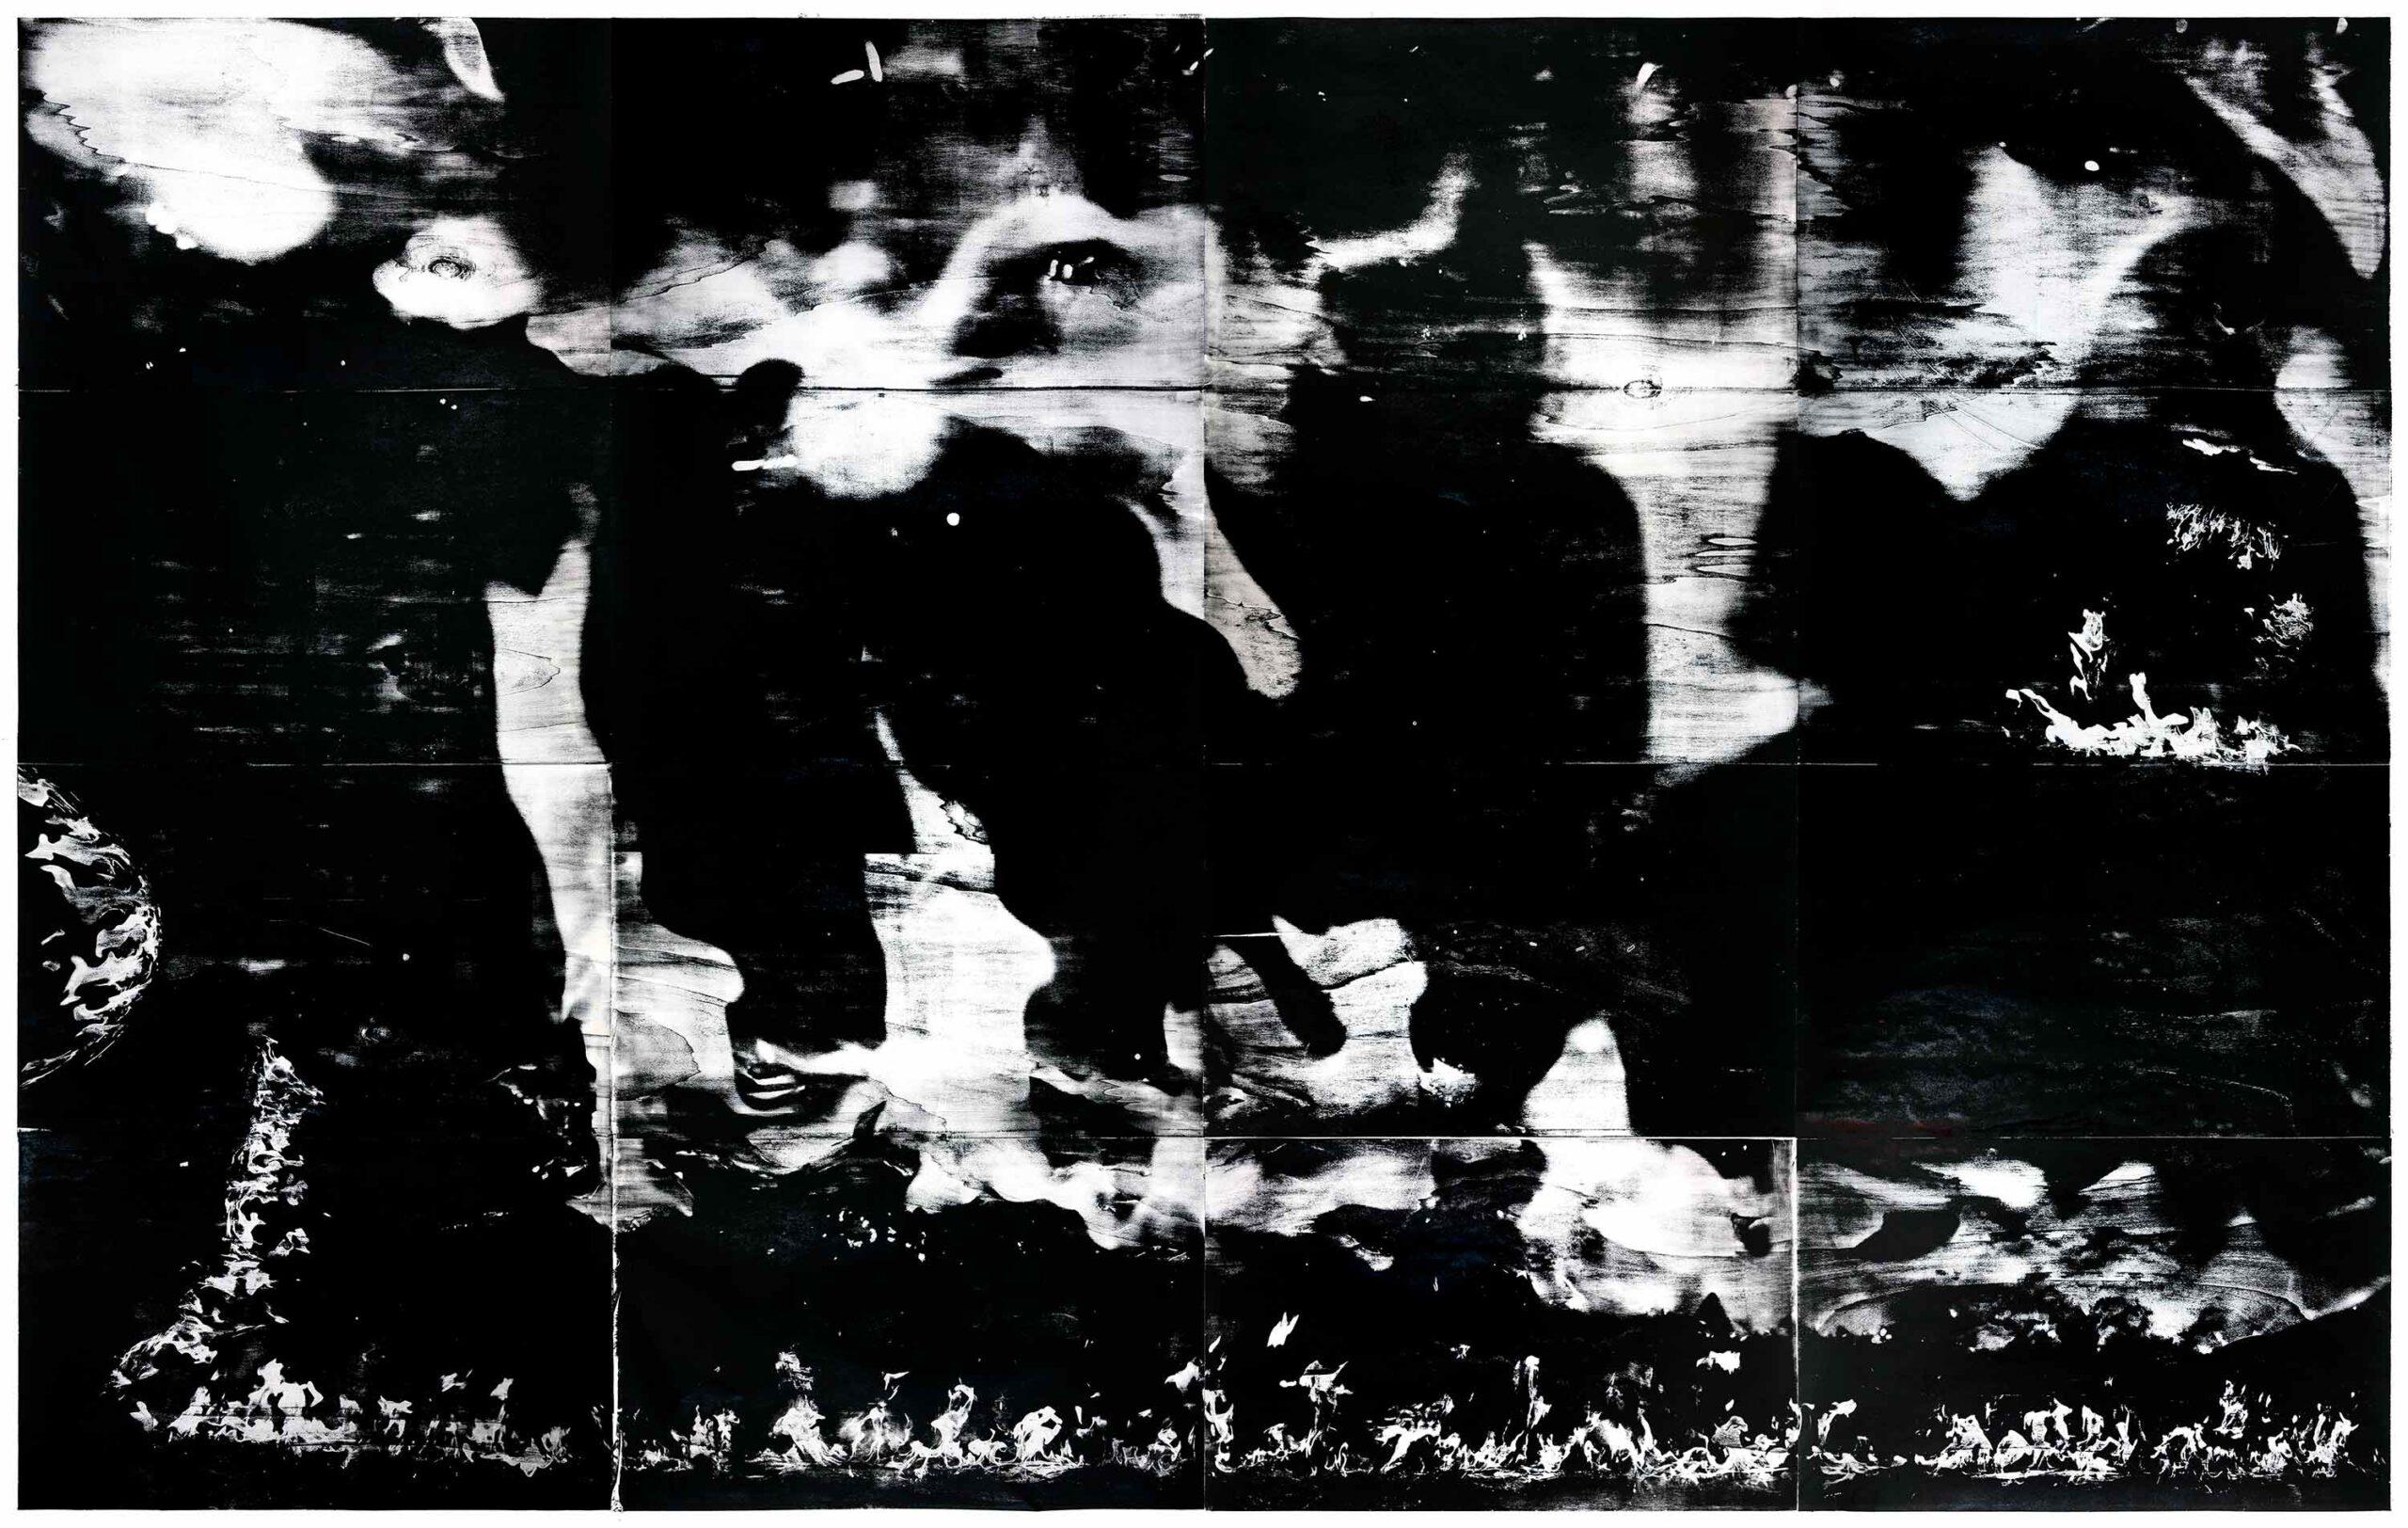 Flammen (s), 2020, wood engraving, 271 x 392 cm